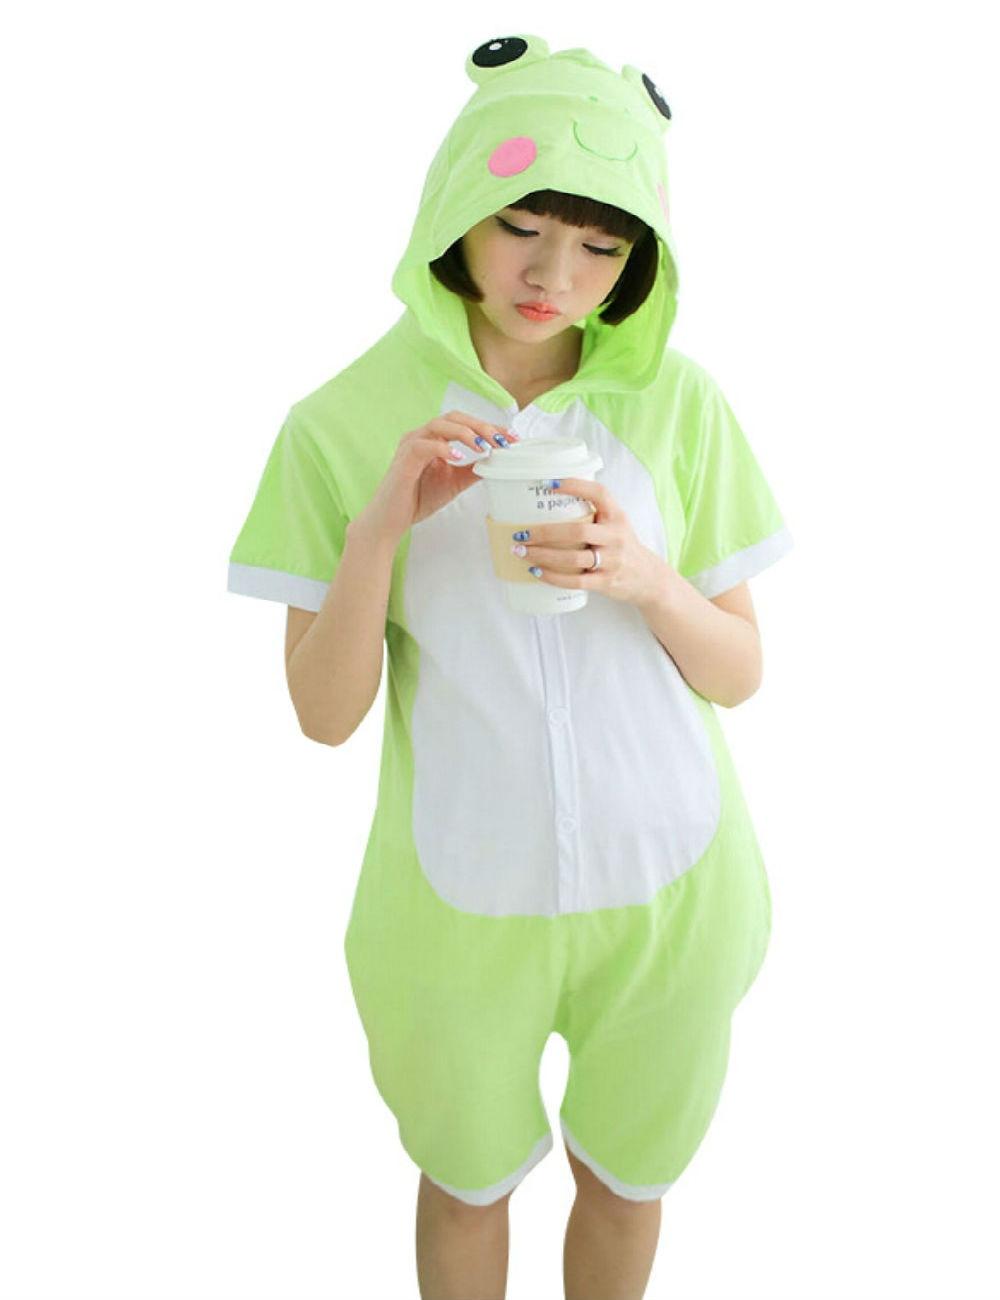 326e2b764 Cartoon Anime Yellow bear Cosplay Costume Summer Jumpsuit Short ...